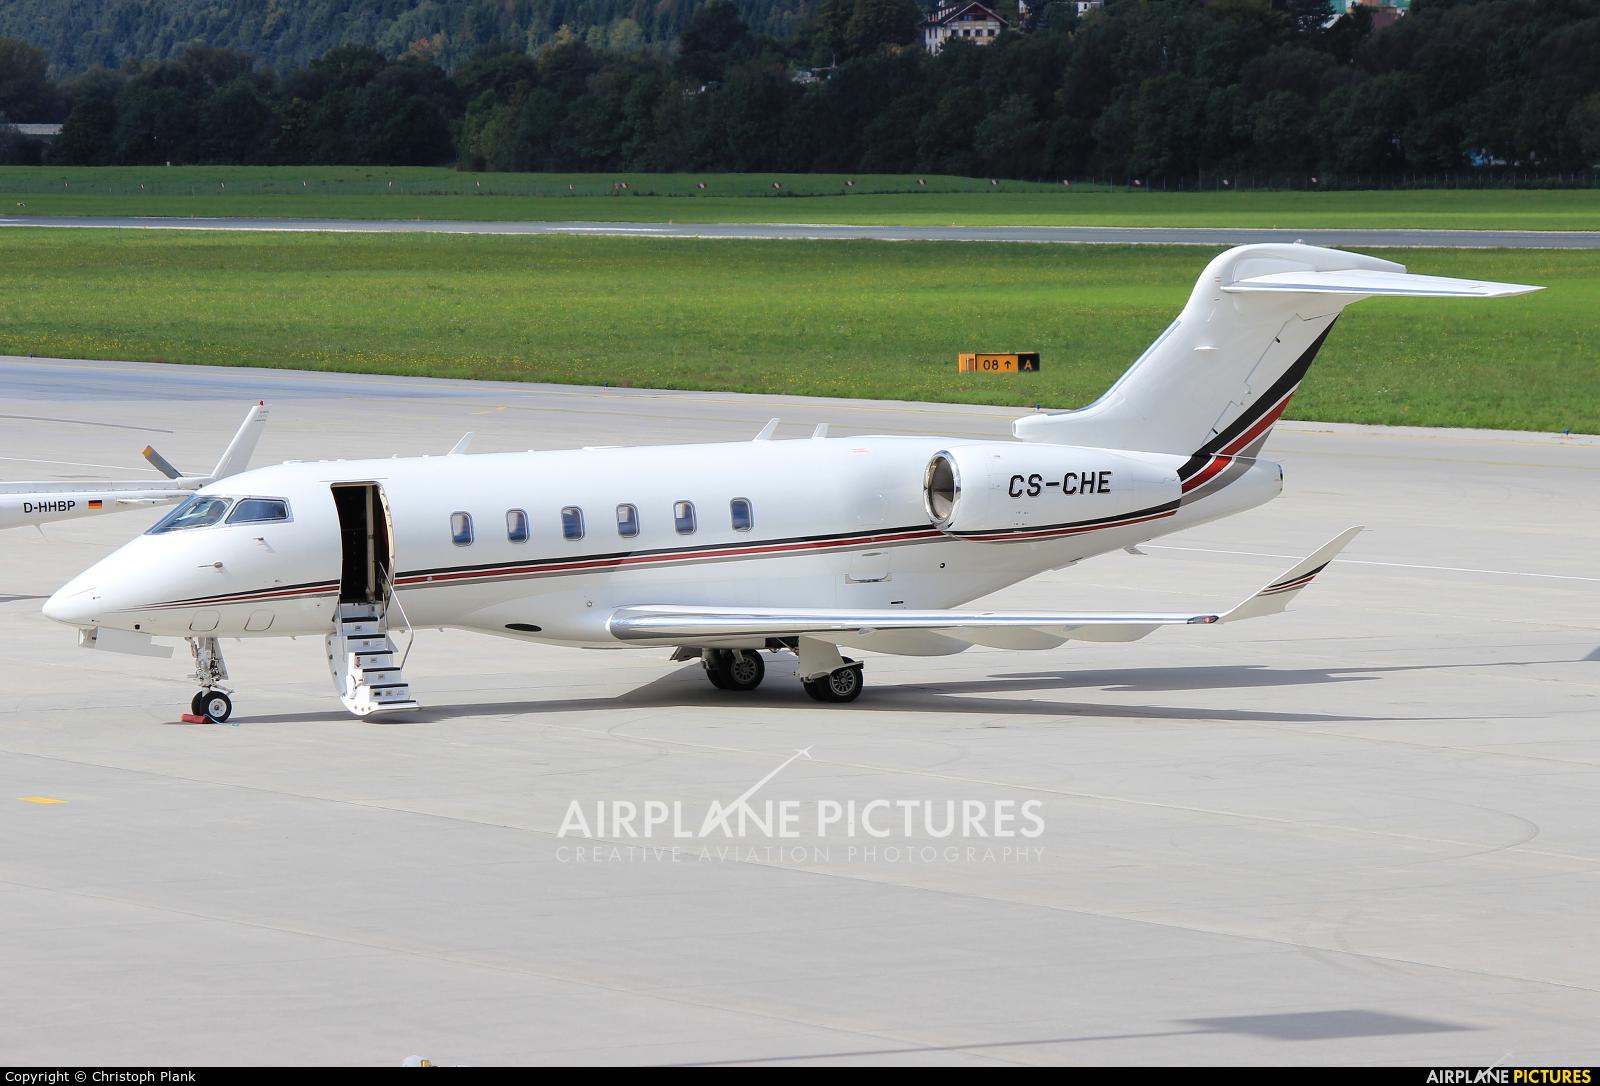 NetJets Europe (Portugal) CS-CHE aircraft at Innsbruck